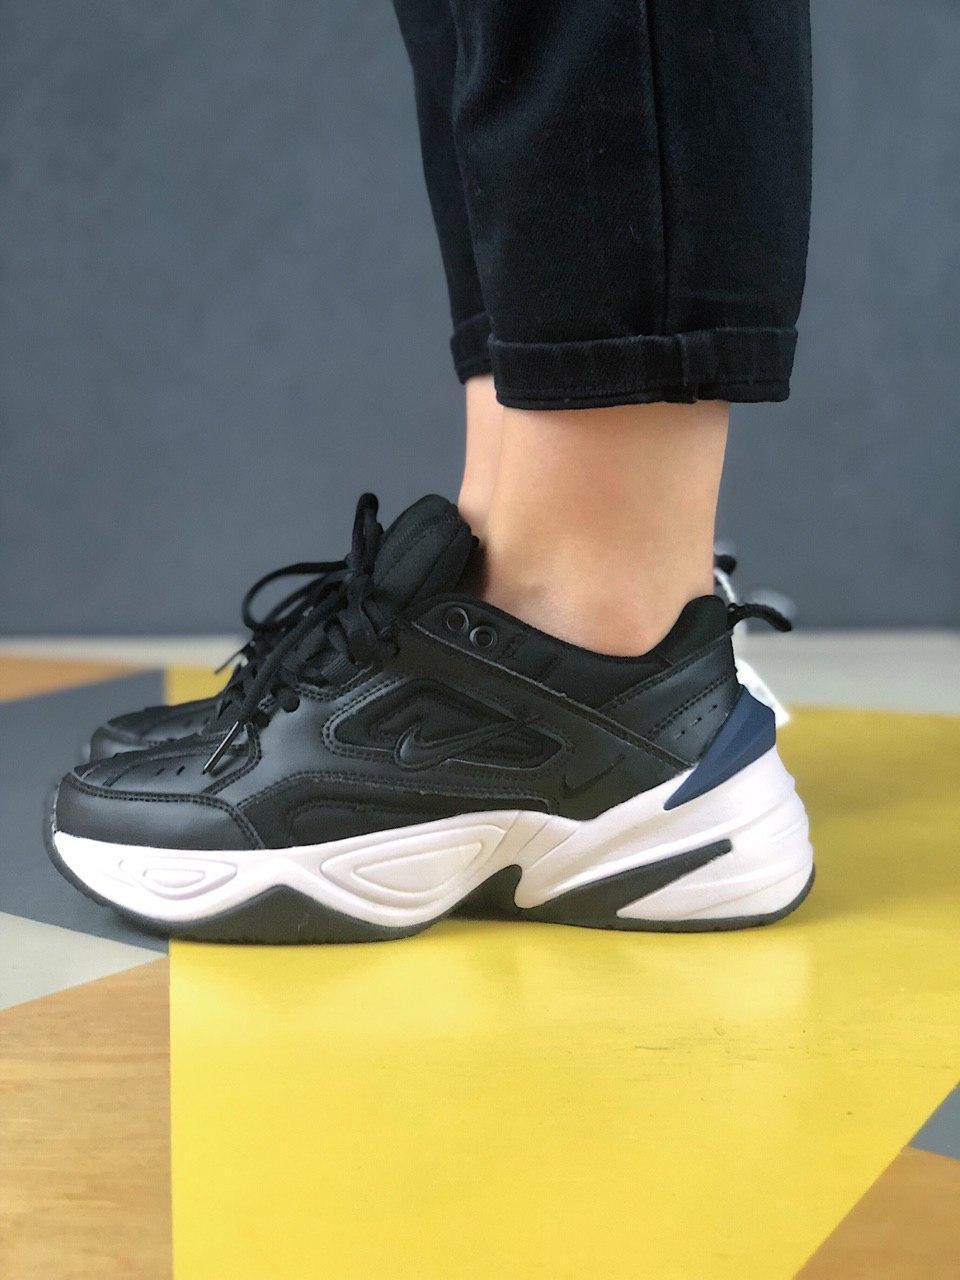 Женские осенние кроссовки Nike M2k Tekno (black/white), кроссовки Найк М2к Текно (Реплика ААА)